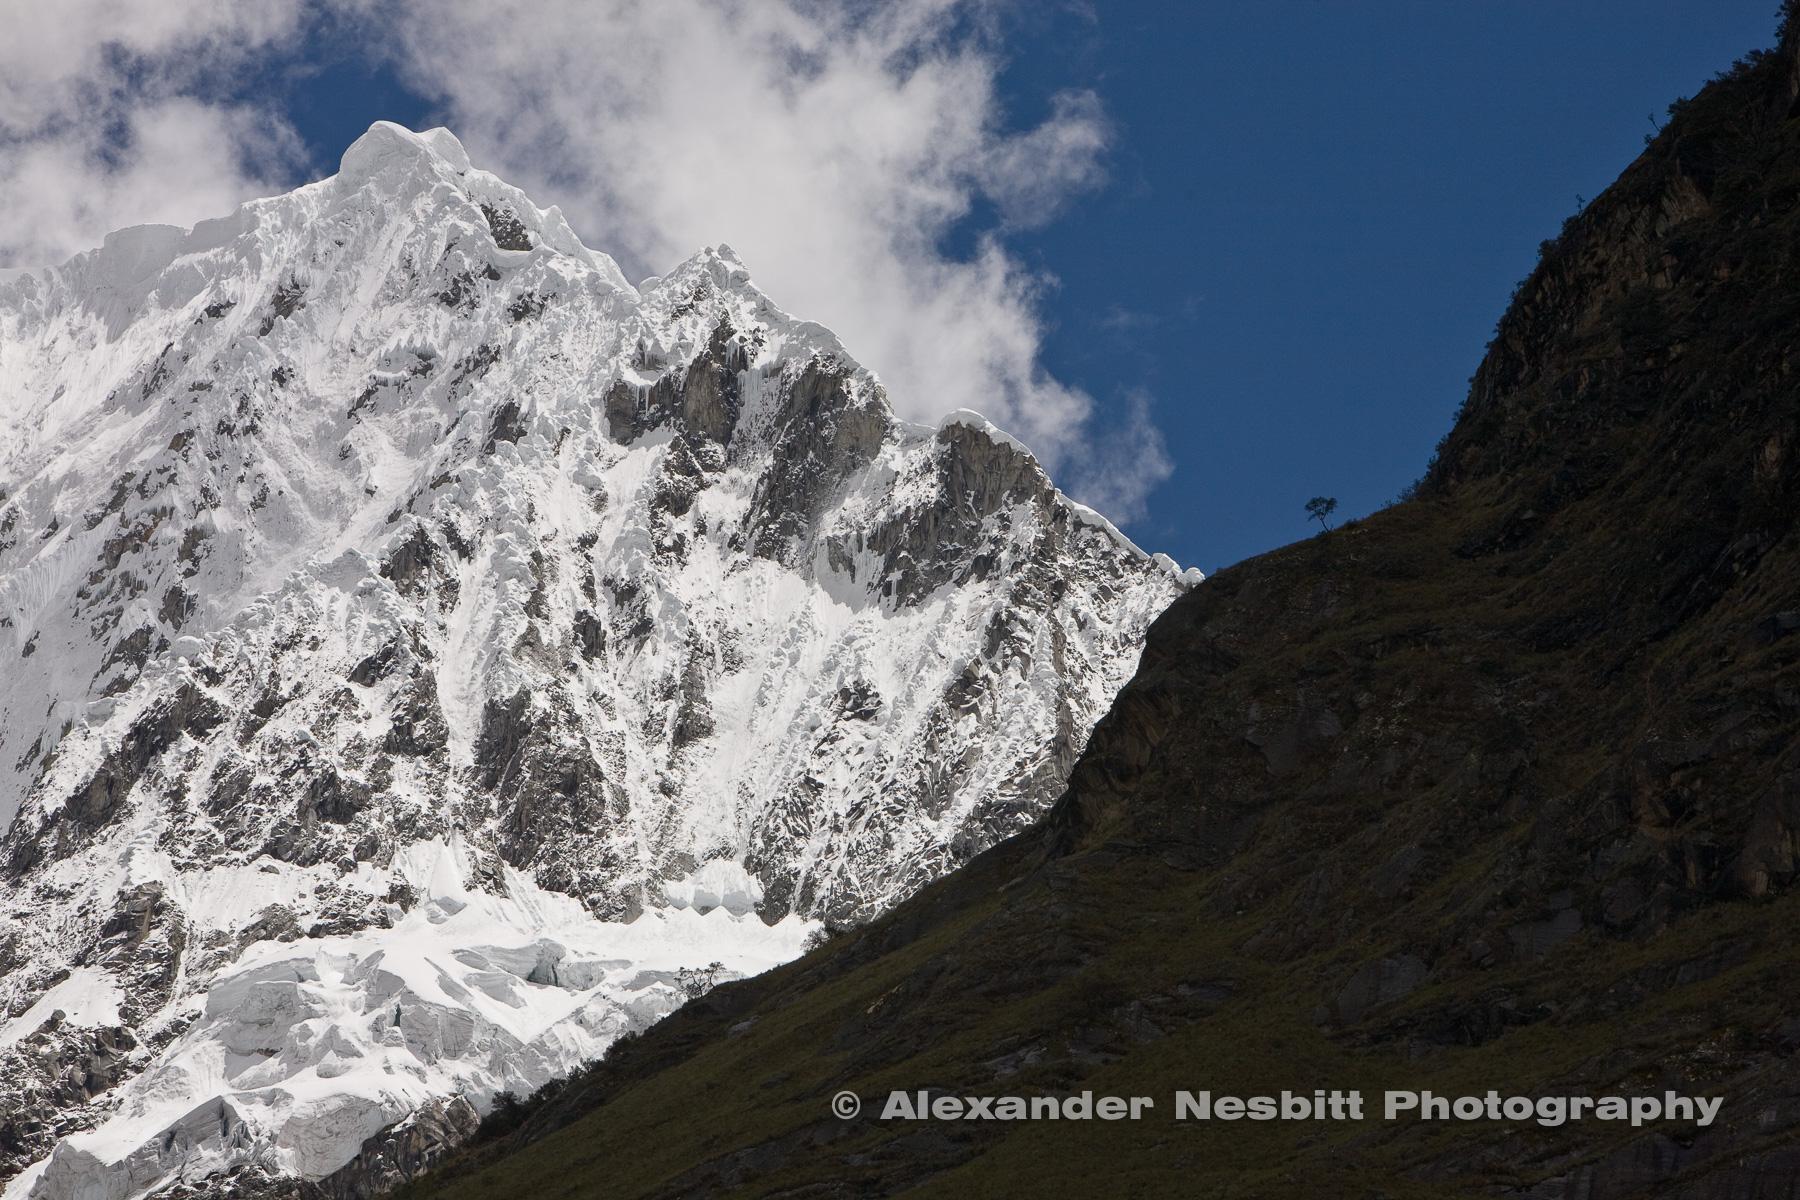 The famous Santa Cruz Trek crosses the Andes between some of it's grandest peaks, near Harez, Peru.